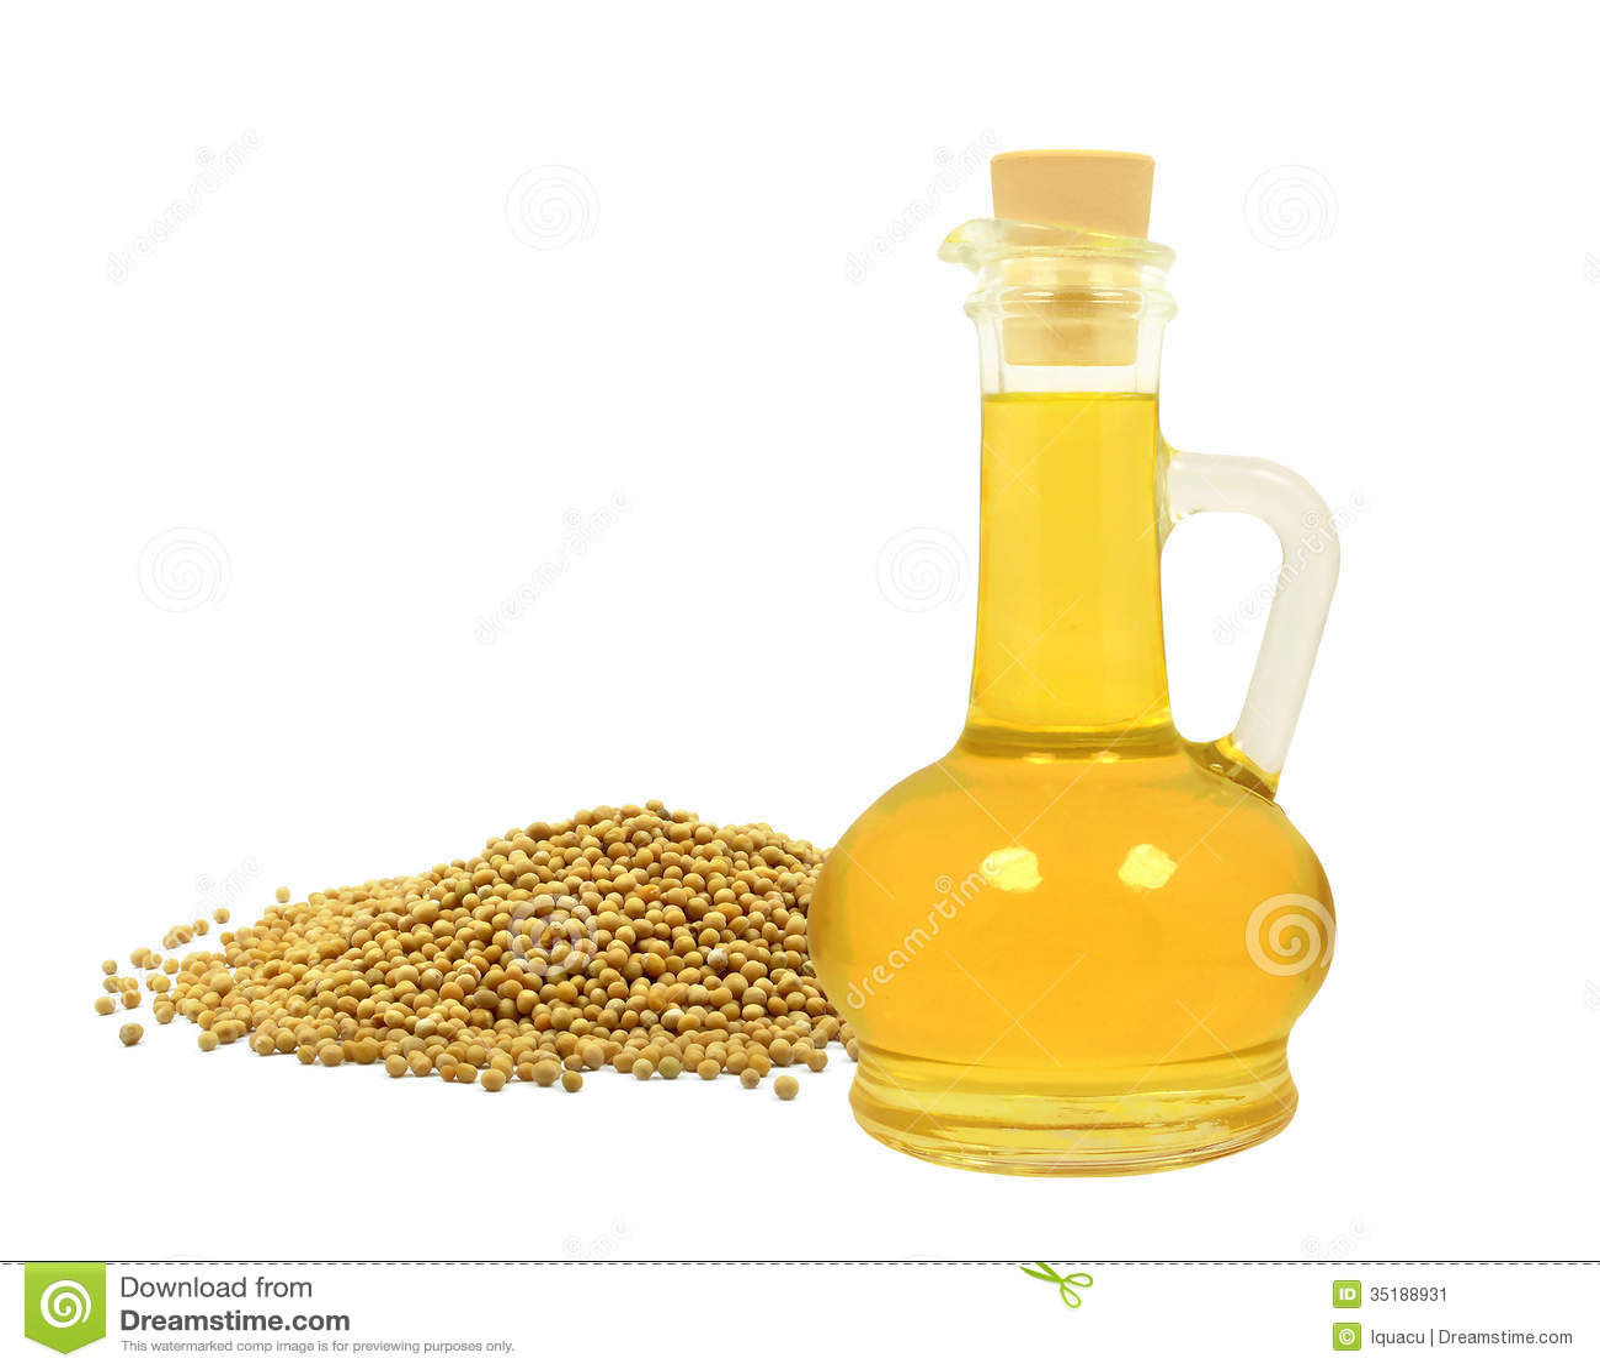 3 ways to promote mustard oil